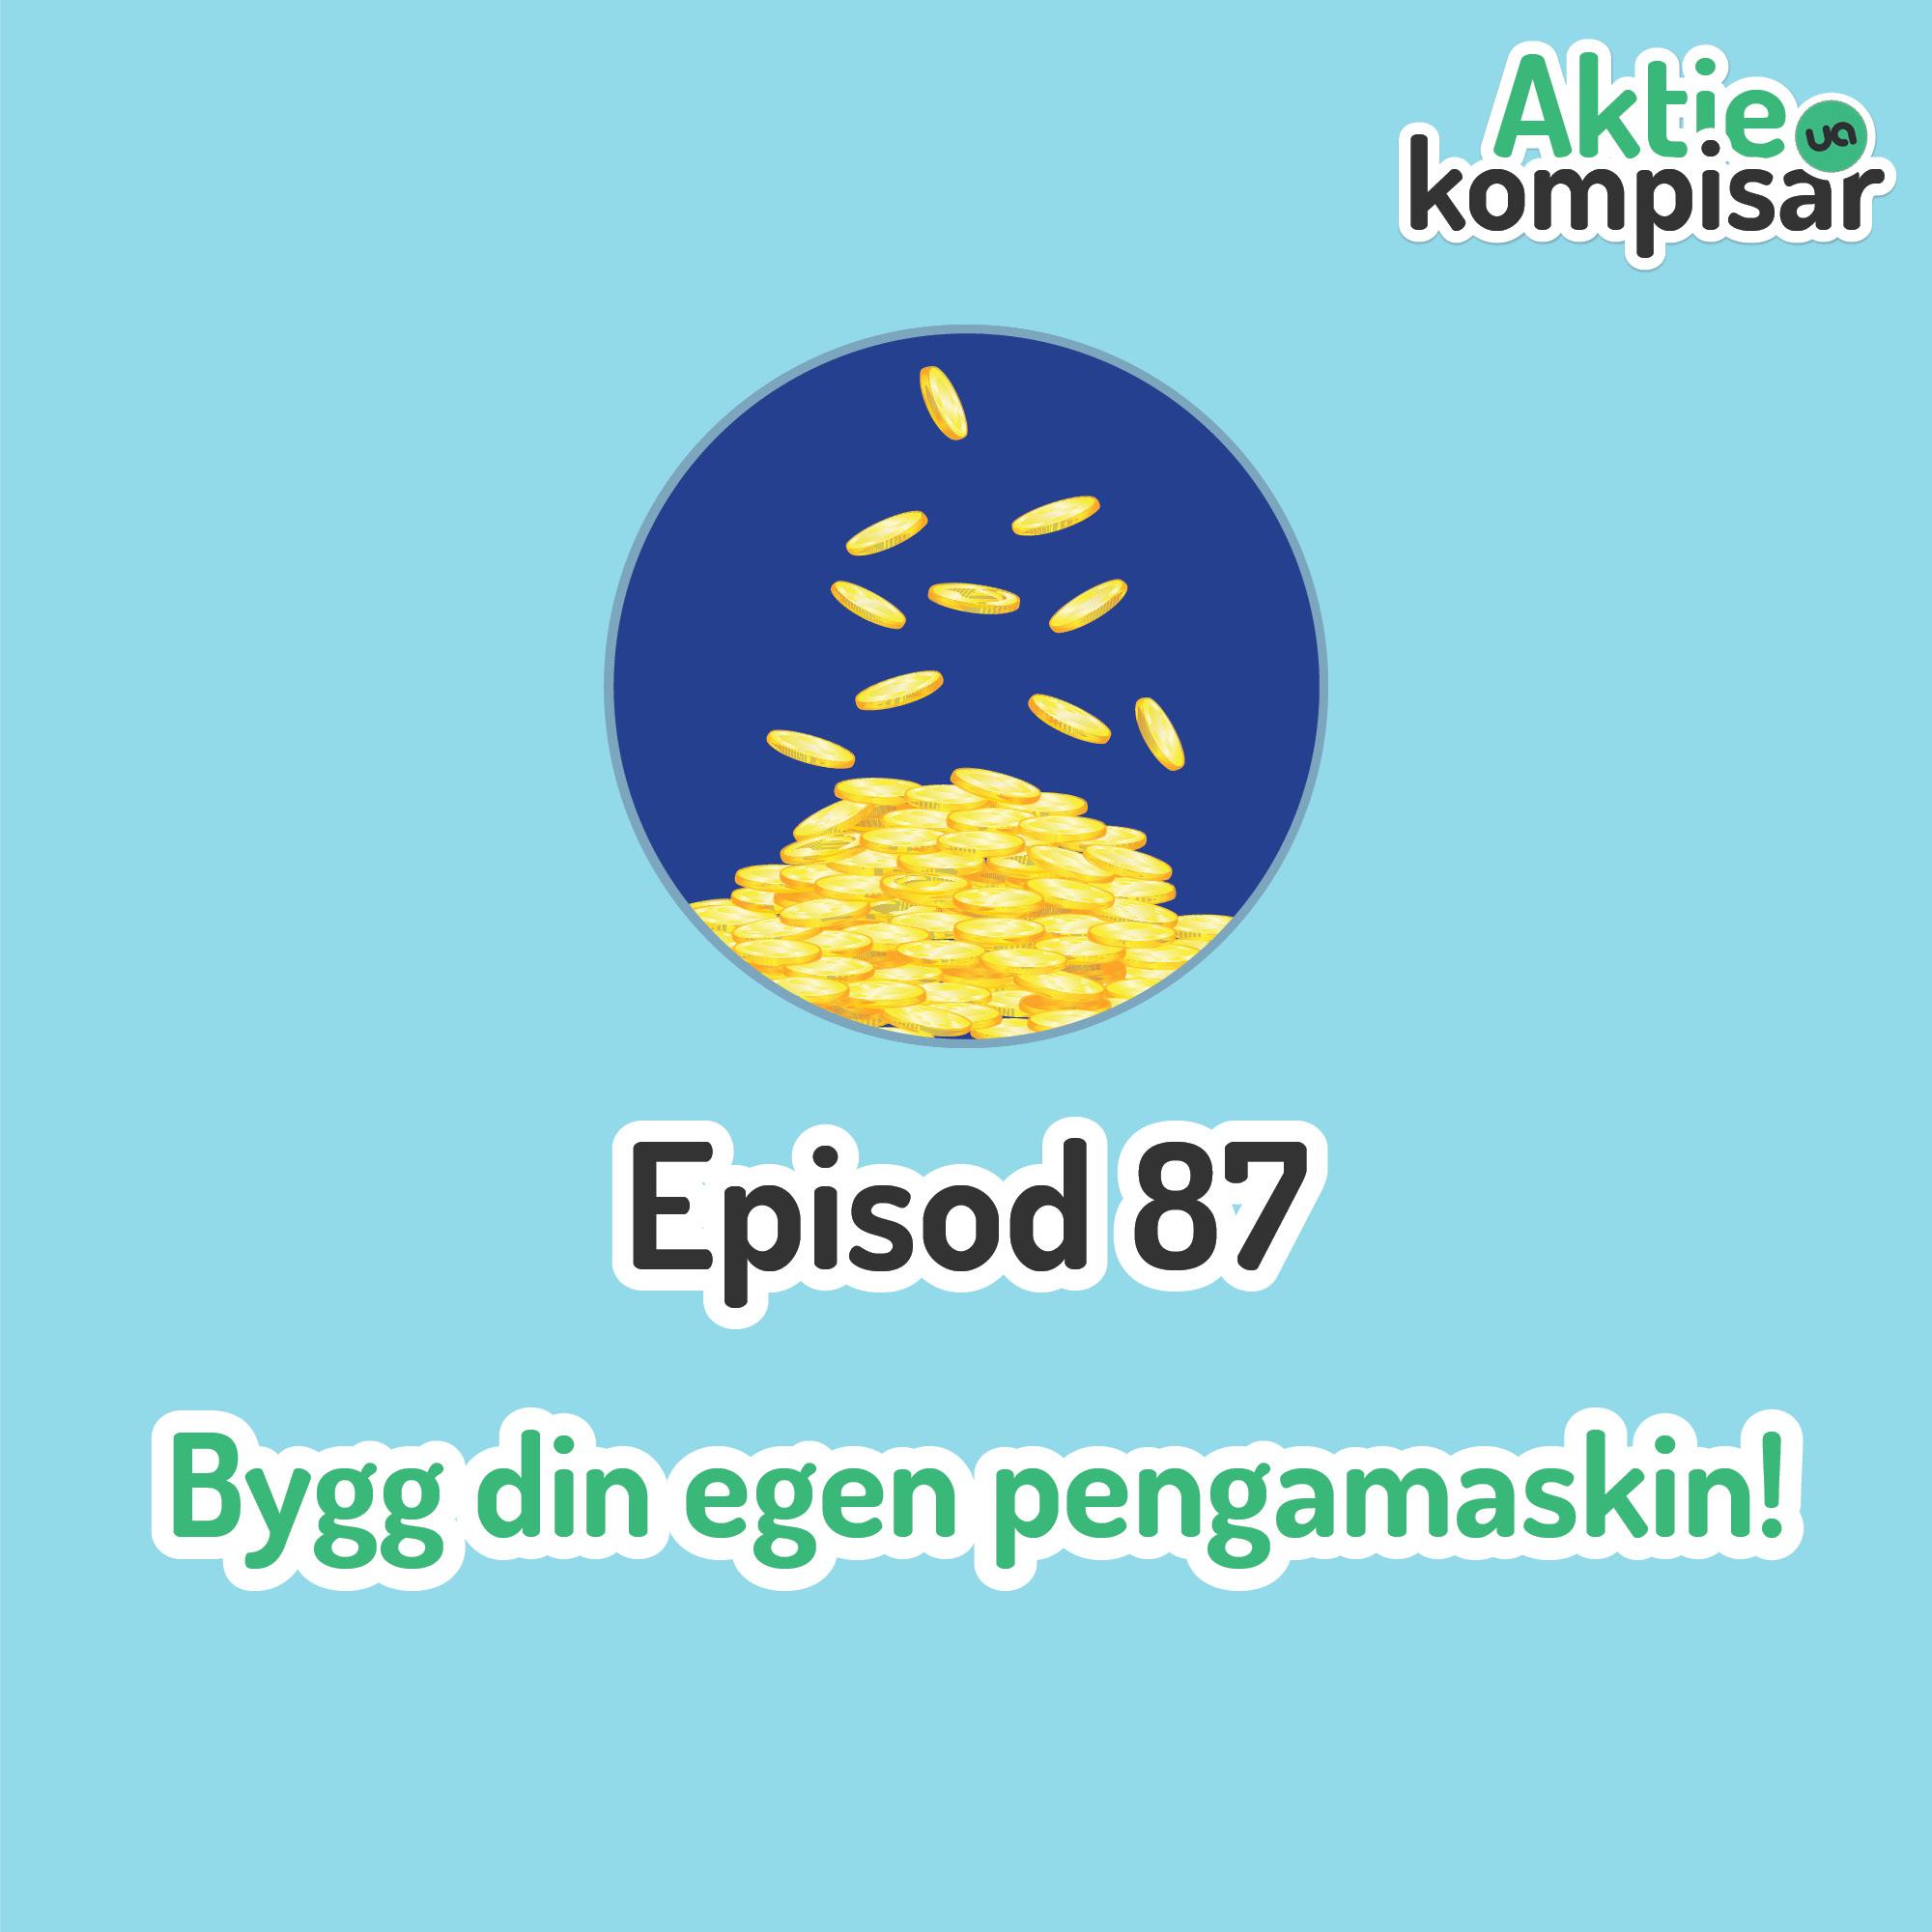 Episod 87 - Bygg din egen pengamaskin!